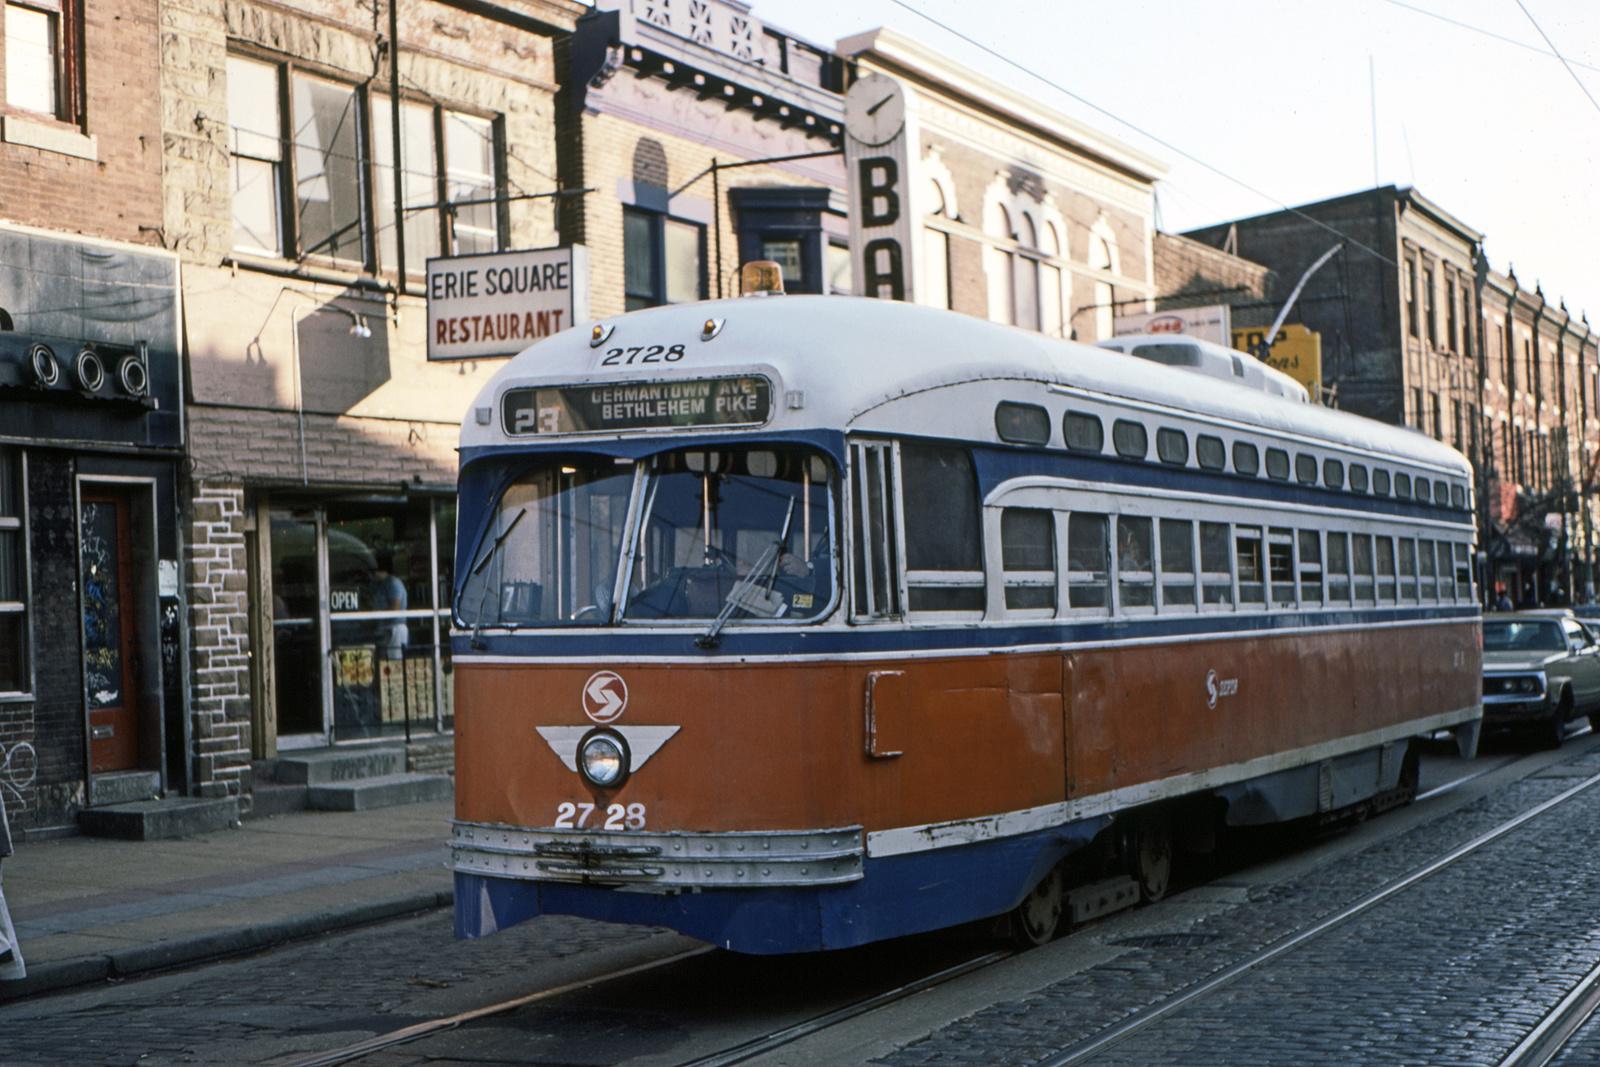 (739k, 1600x1067)<br><b>Country:</b> United States<br><b>City:</b> Philadelphia, PA<br><b>System:</b> SEPTA (or Predecessor)<br><b>Line:</b> Rt. 23-Germantown<br><b>Location:</b> Germantown/Broad/Erie<br><b>Car:</b> PTC/SEPTA Postwar All-electric PCC (St.Louis, 1947) 2728 <br><b>Collection of:</b> David Pirmann<br><b>Date:</b> 2/1984<br><b>Viewed (this week/total):</b> 0 / 44